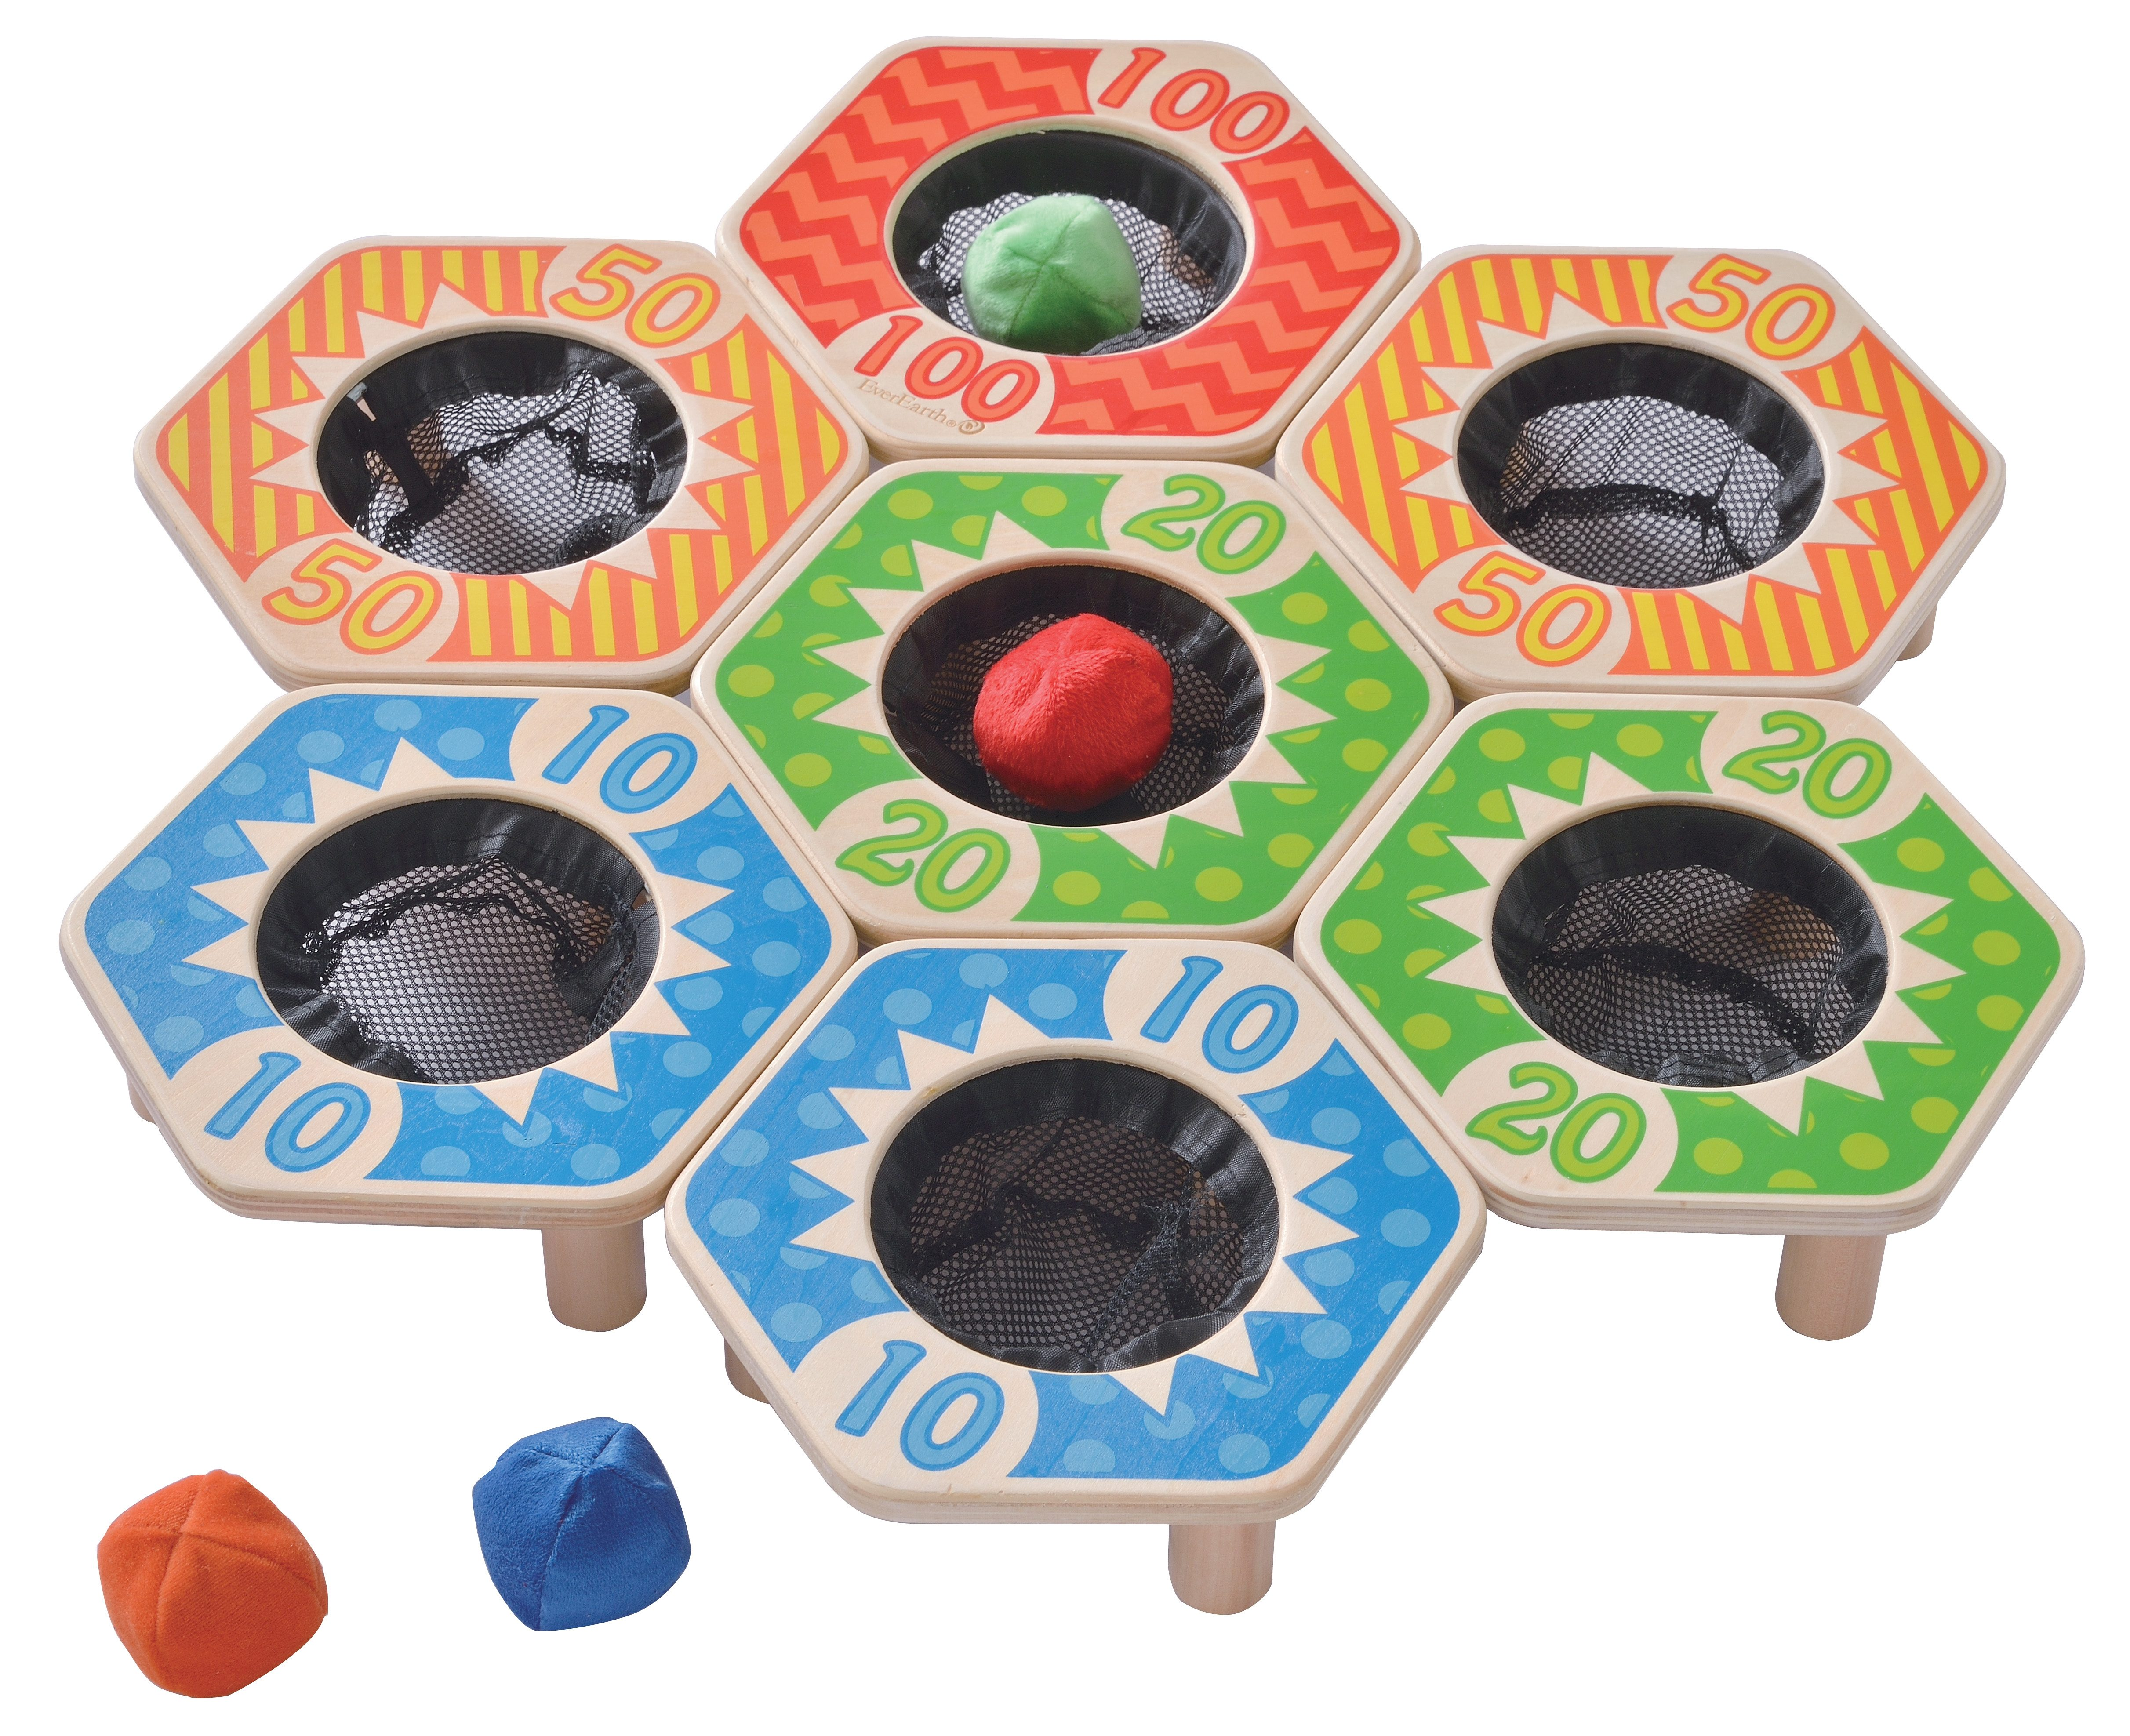 EverEarth® Holz-Spiel, »Wurf-Ball-Spiel«